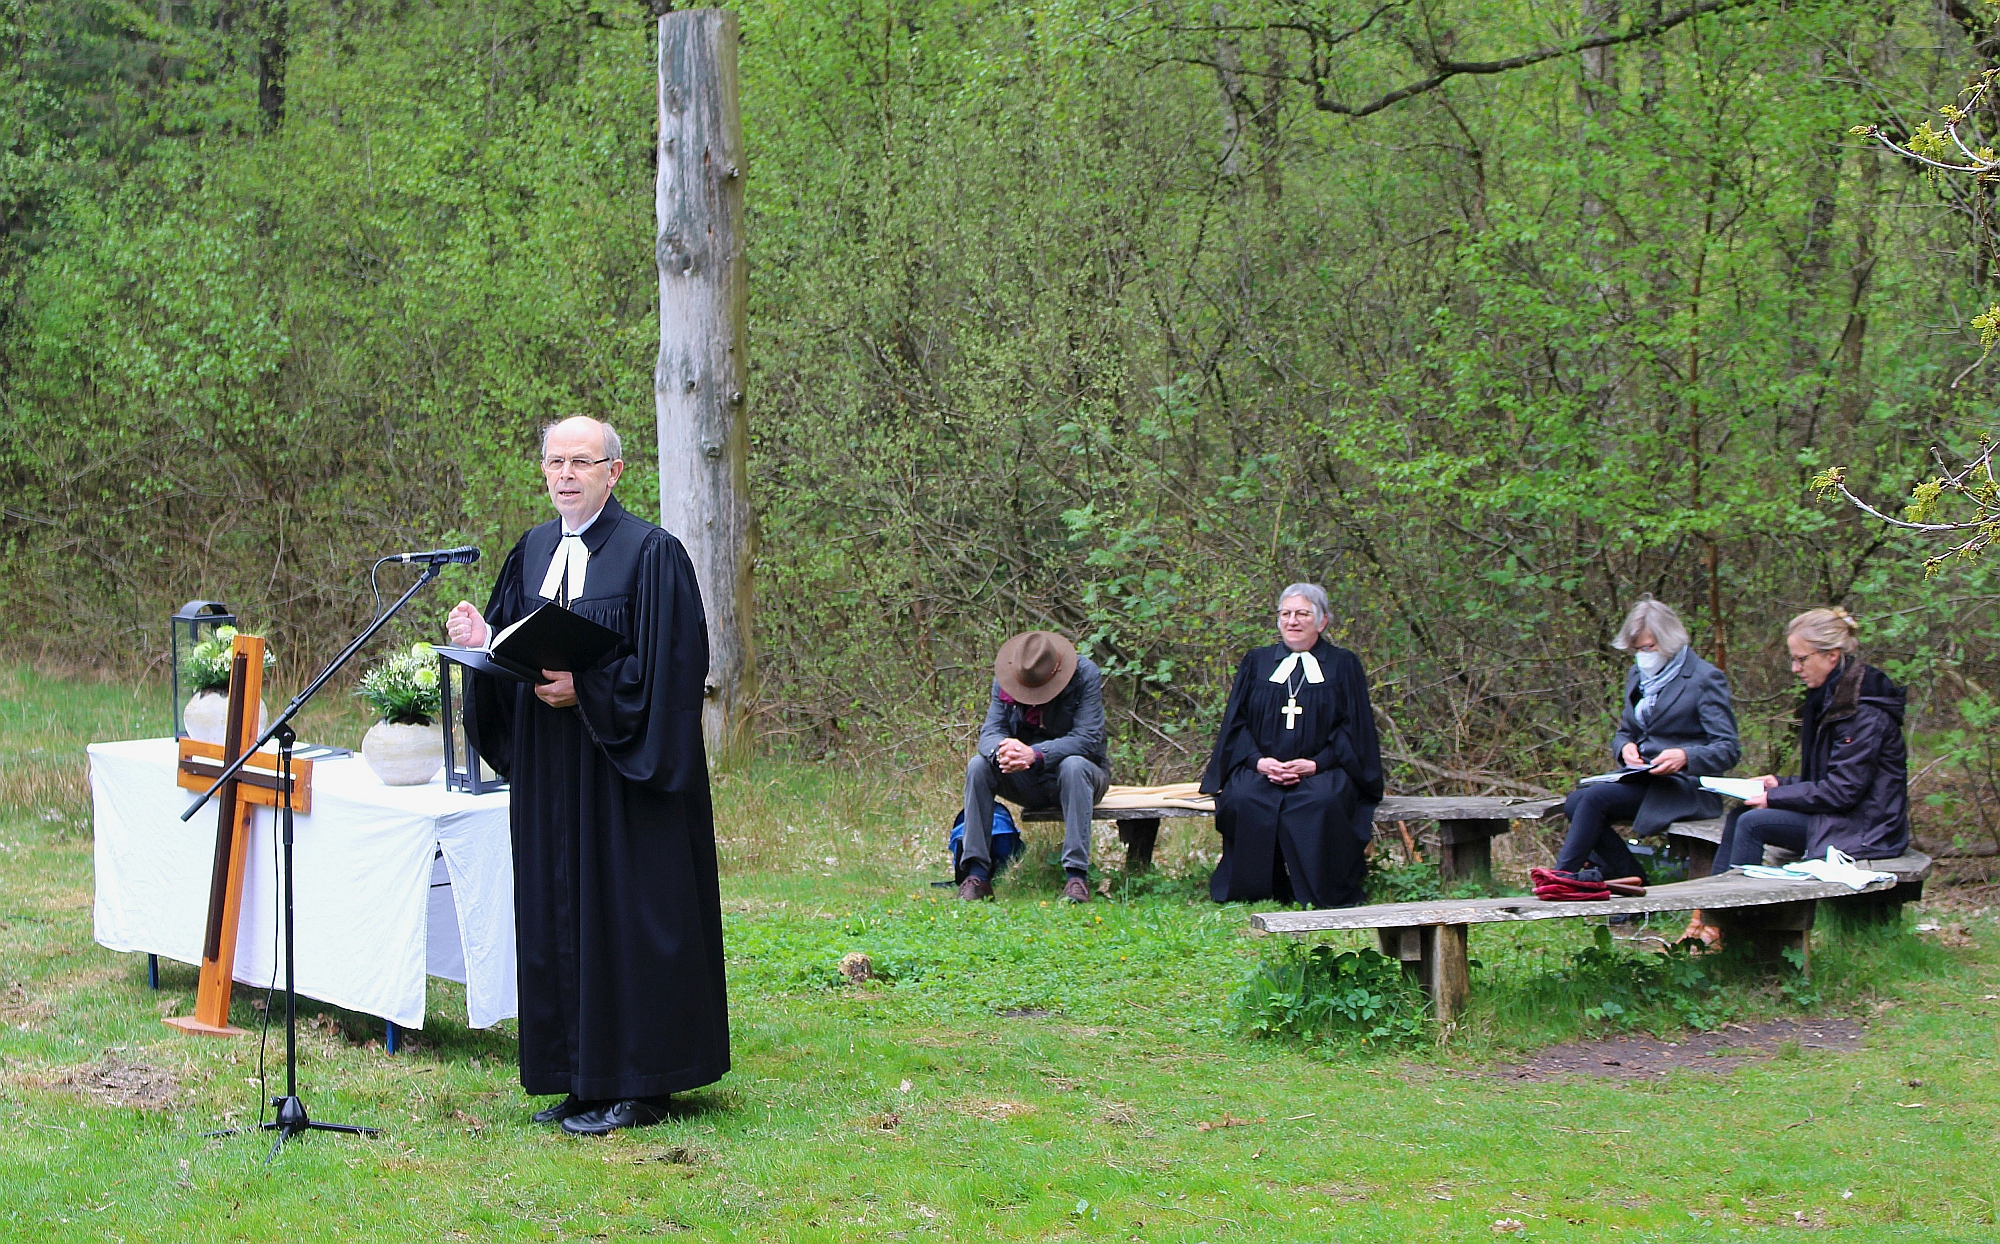 Himmelfahrt 2021 - 8 web Bildrecht Ev. Kirchengemeinde Leck